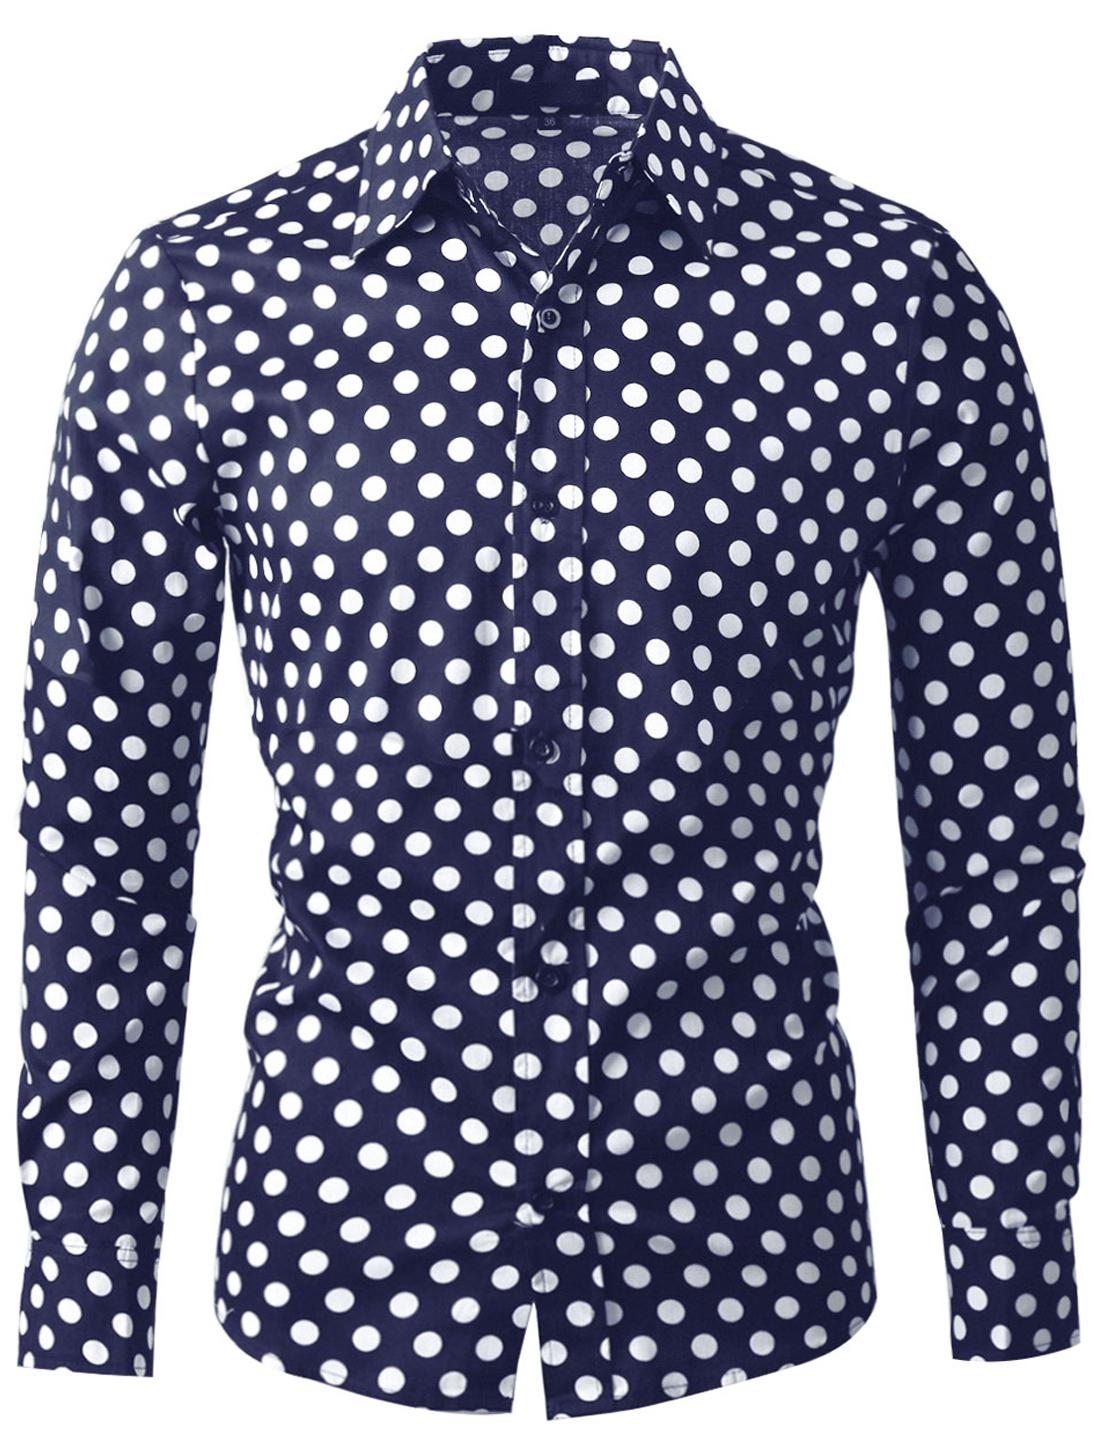 Men 100% Cotton Polka Dots Long Sleeve Slim Fit Dress Shirt Navy Blue 38